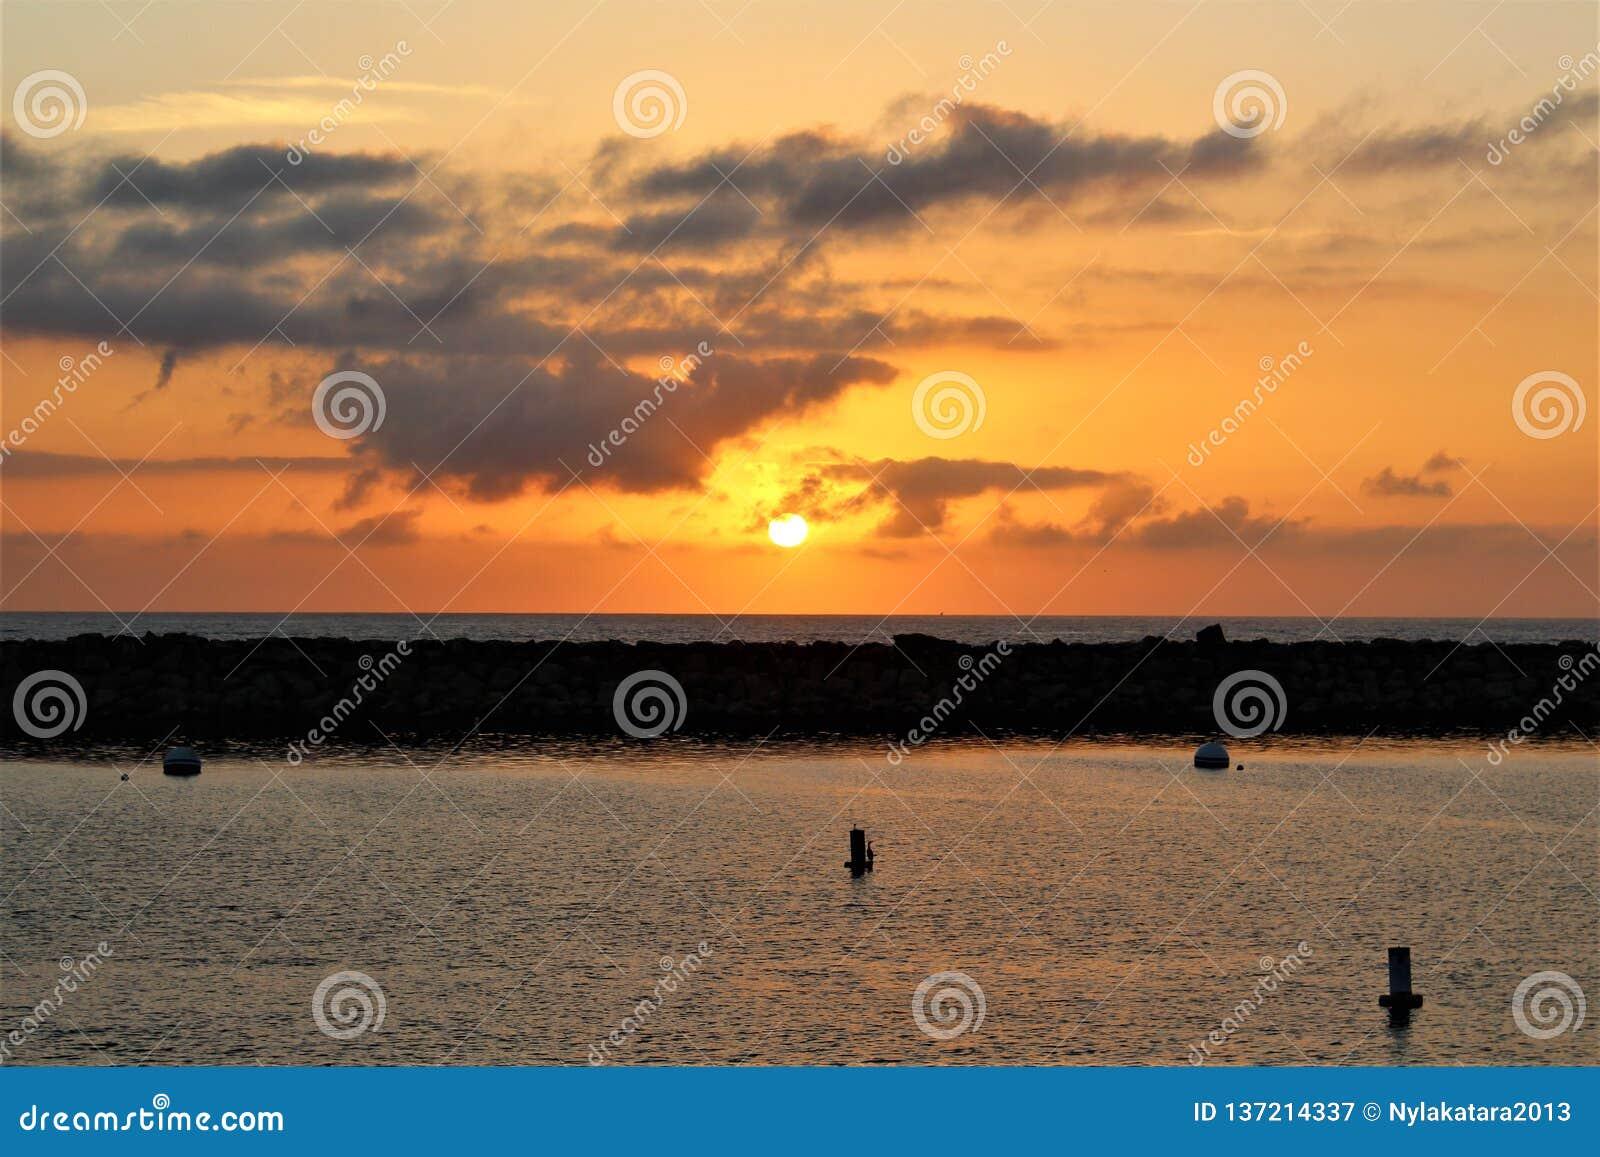 Portifino California ocean side sunset in Redondo Beach, California, United States